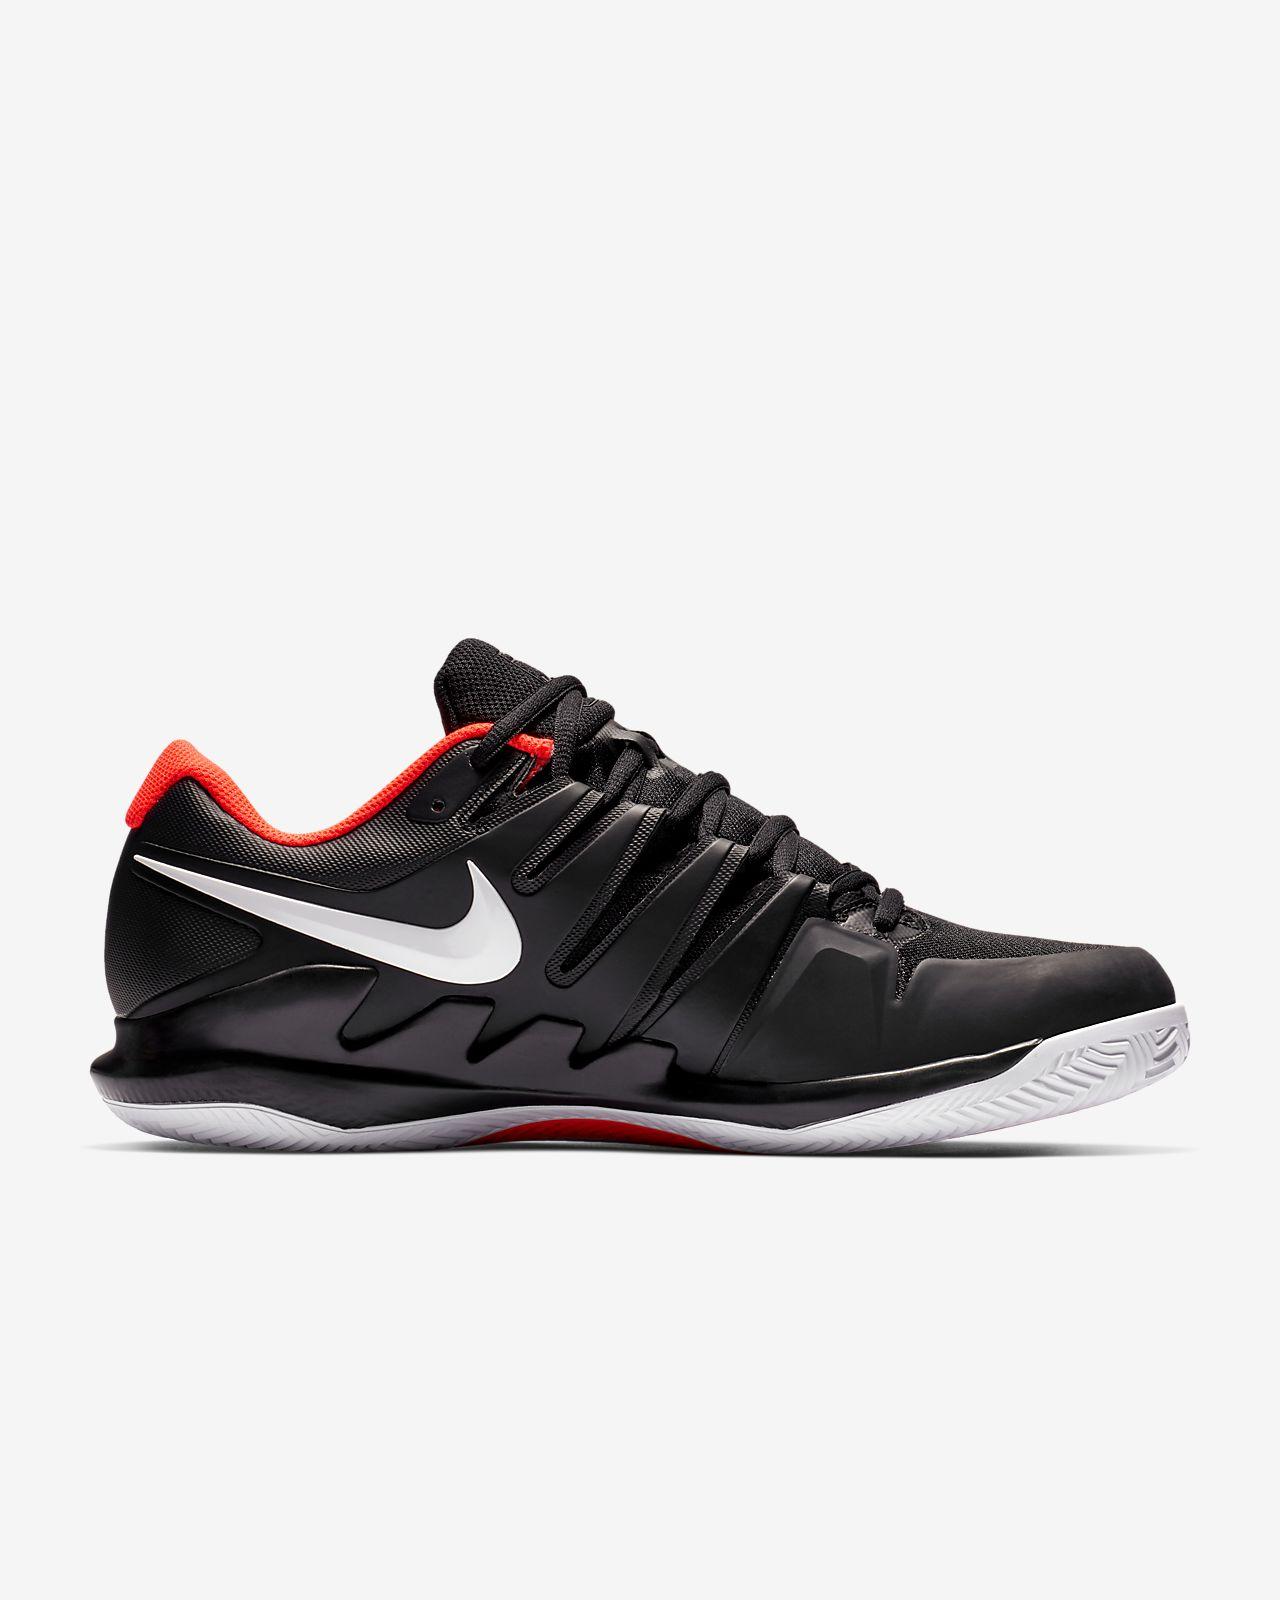 separation shoes cc0a3 f7834 ... Nike Air Zoom Vapor X Clay Men s Tennis Shoe